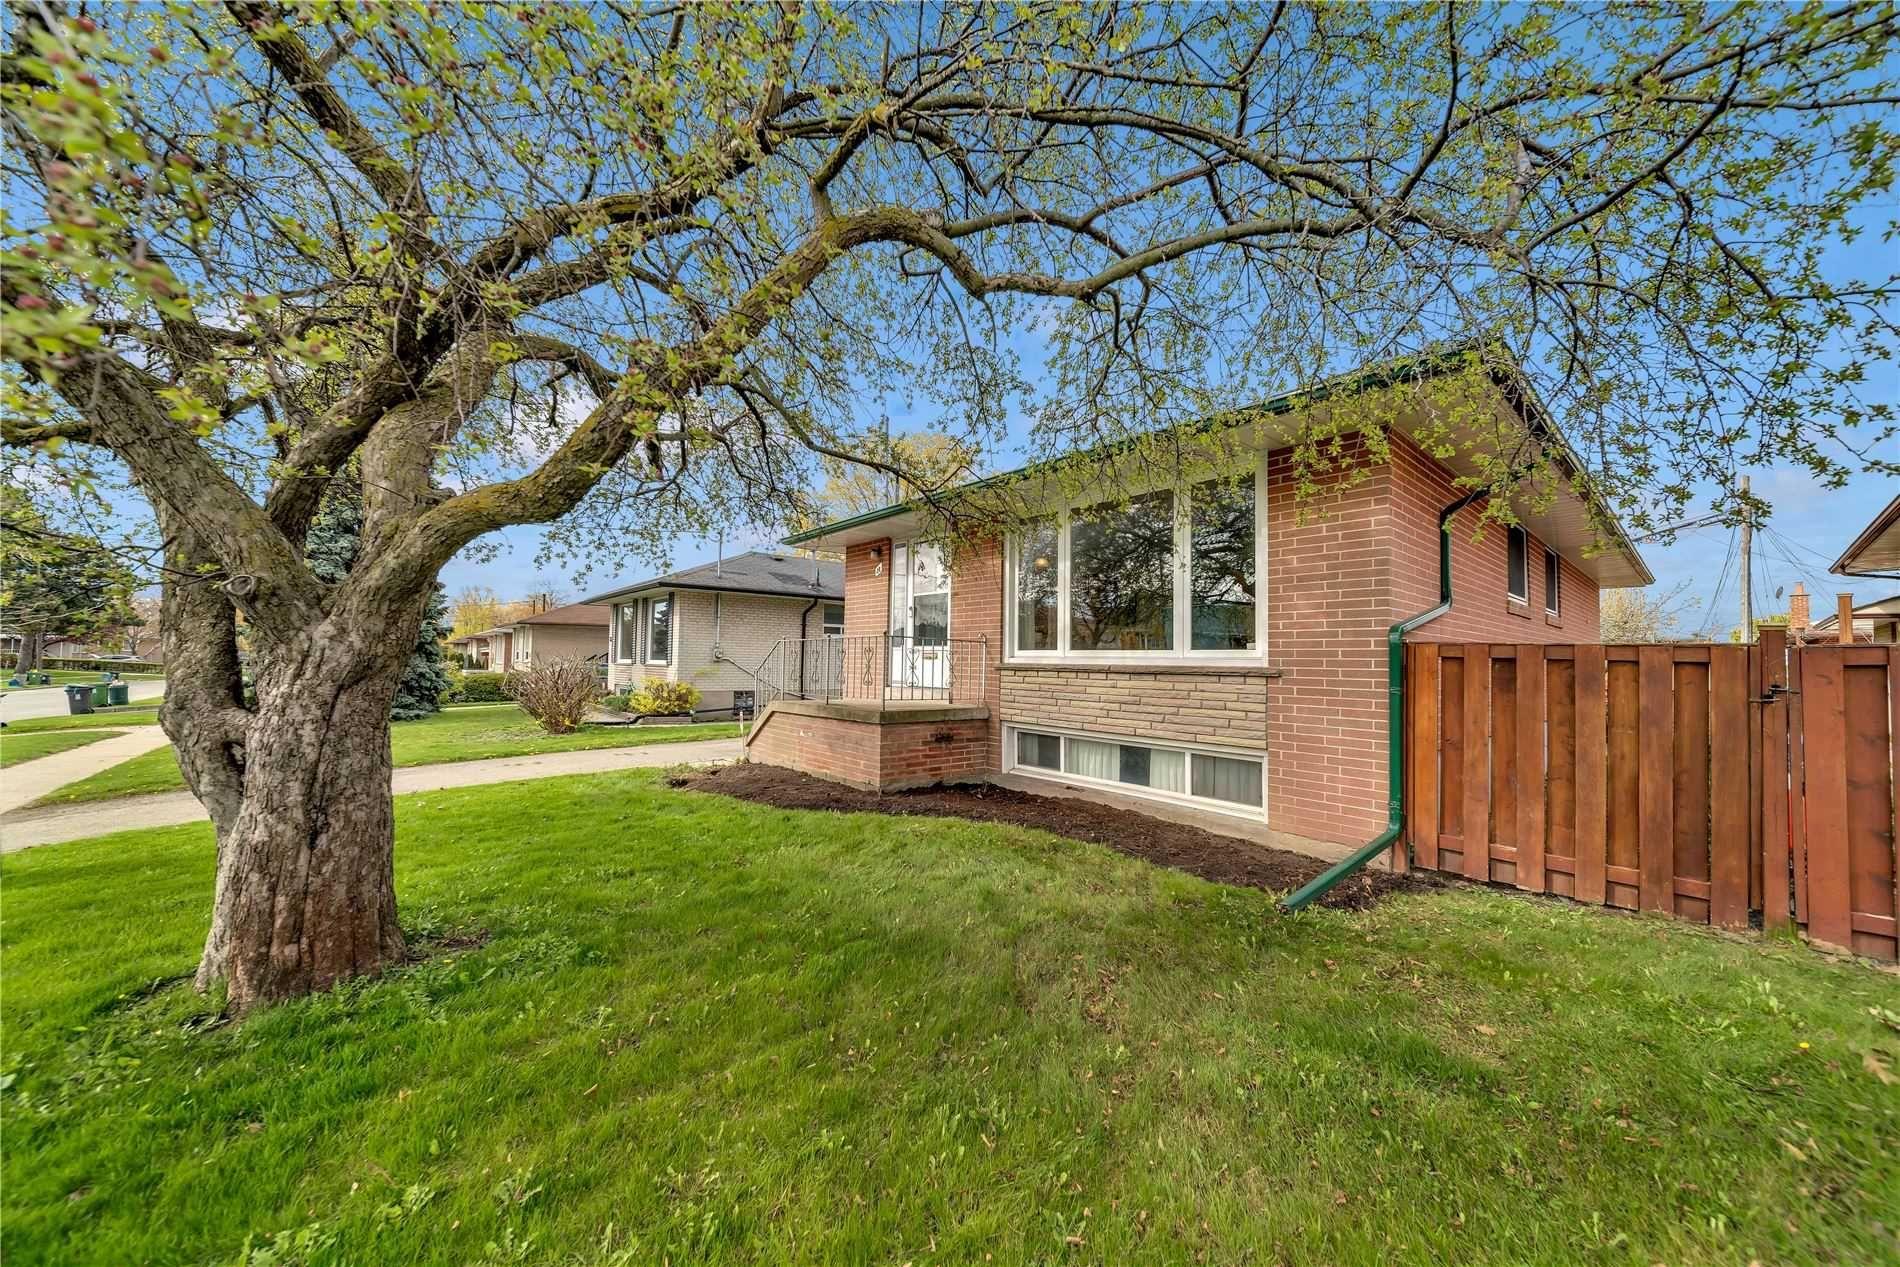 Main Photo: 28 Reno Drive in Toronto: Ionview House (Bungalow) for sale (Toronto E04)  : MLS®# E5226714